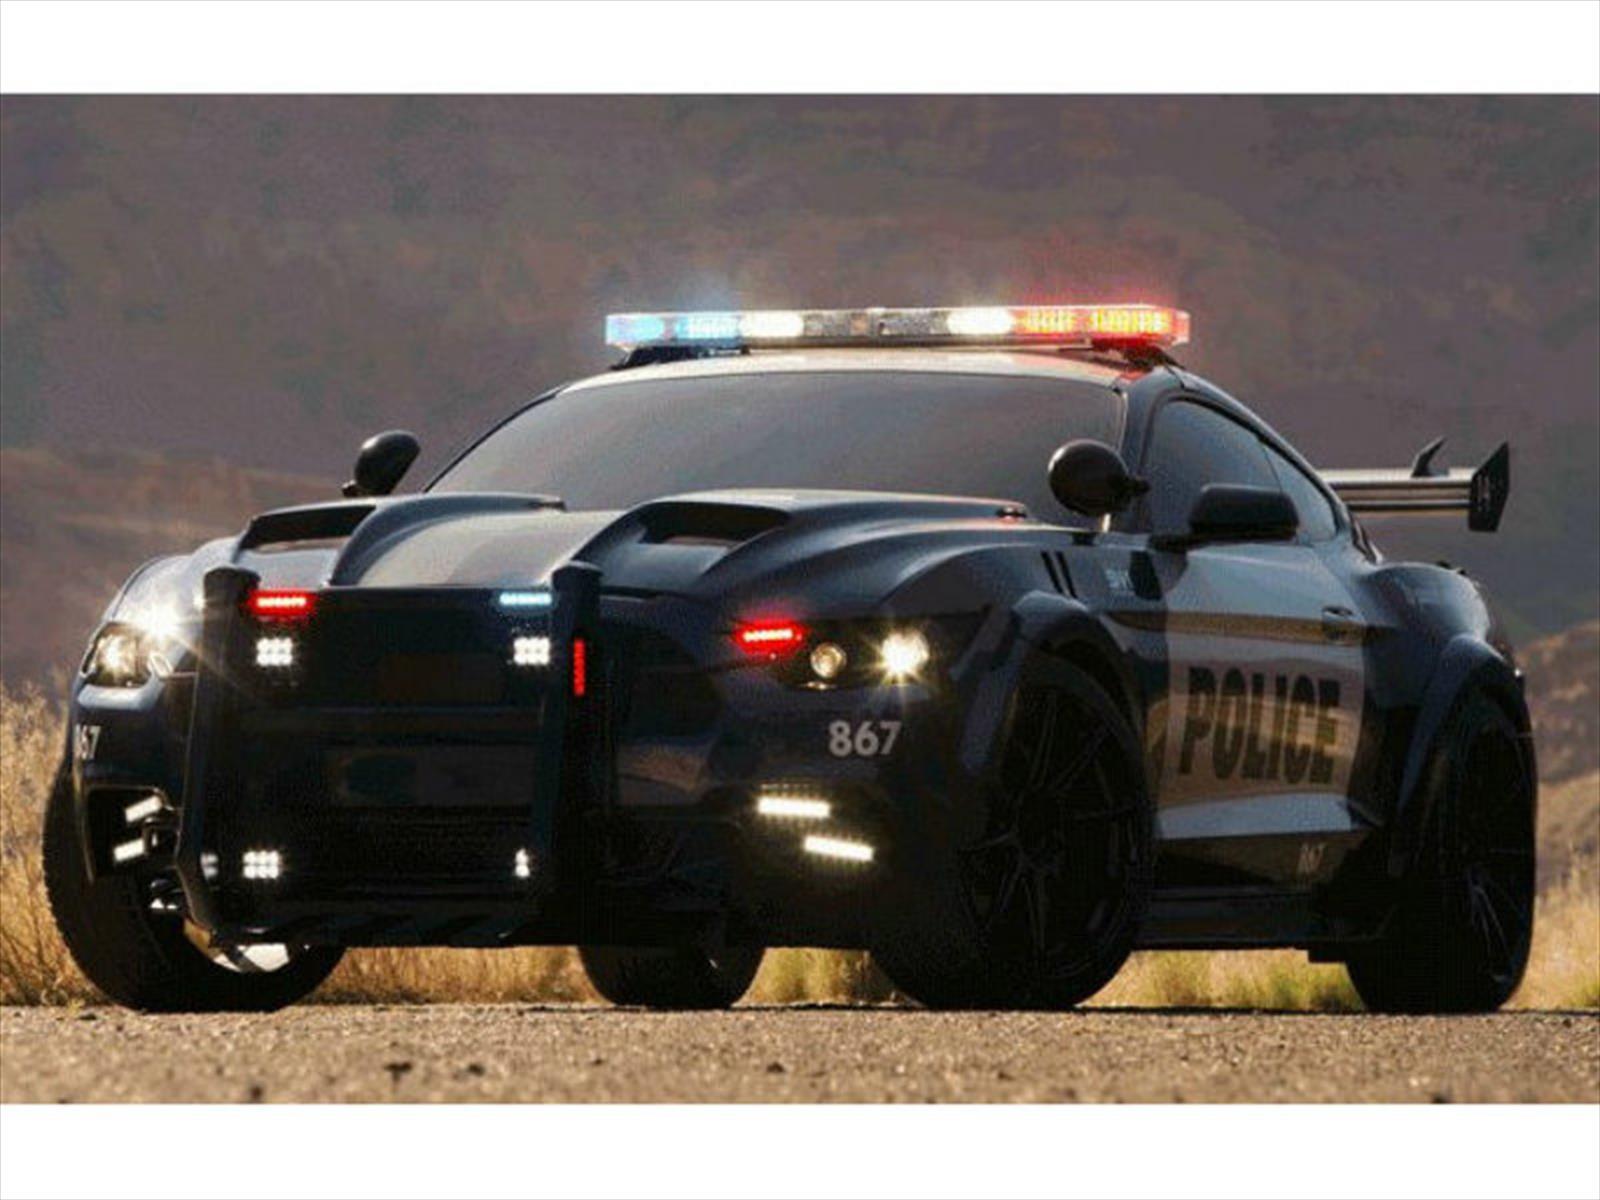 Ford Mustang Barricada, la patrulla de Transformers: The Last Knight